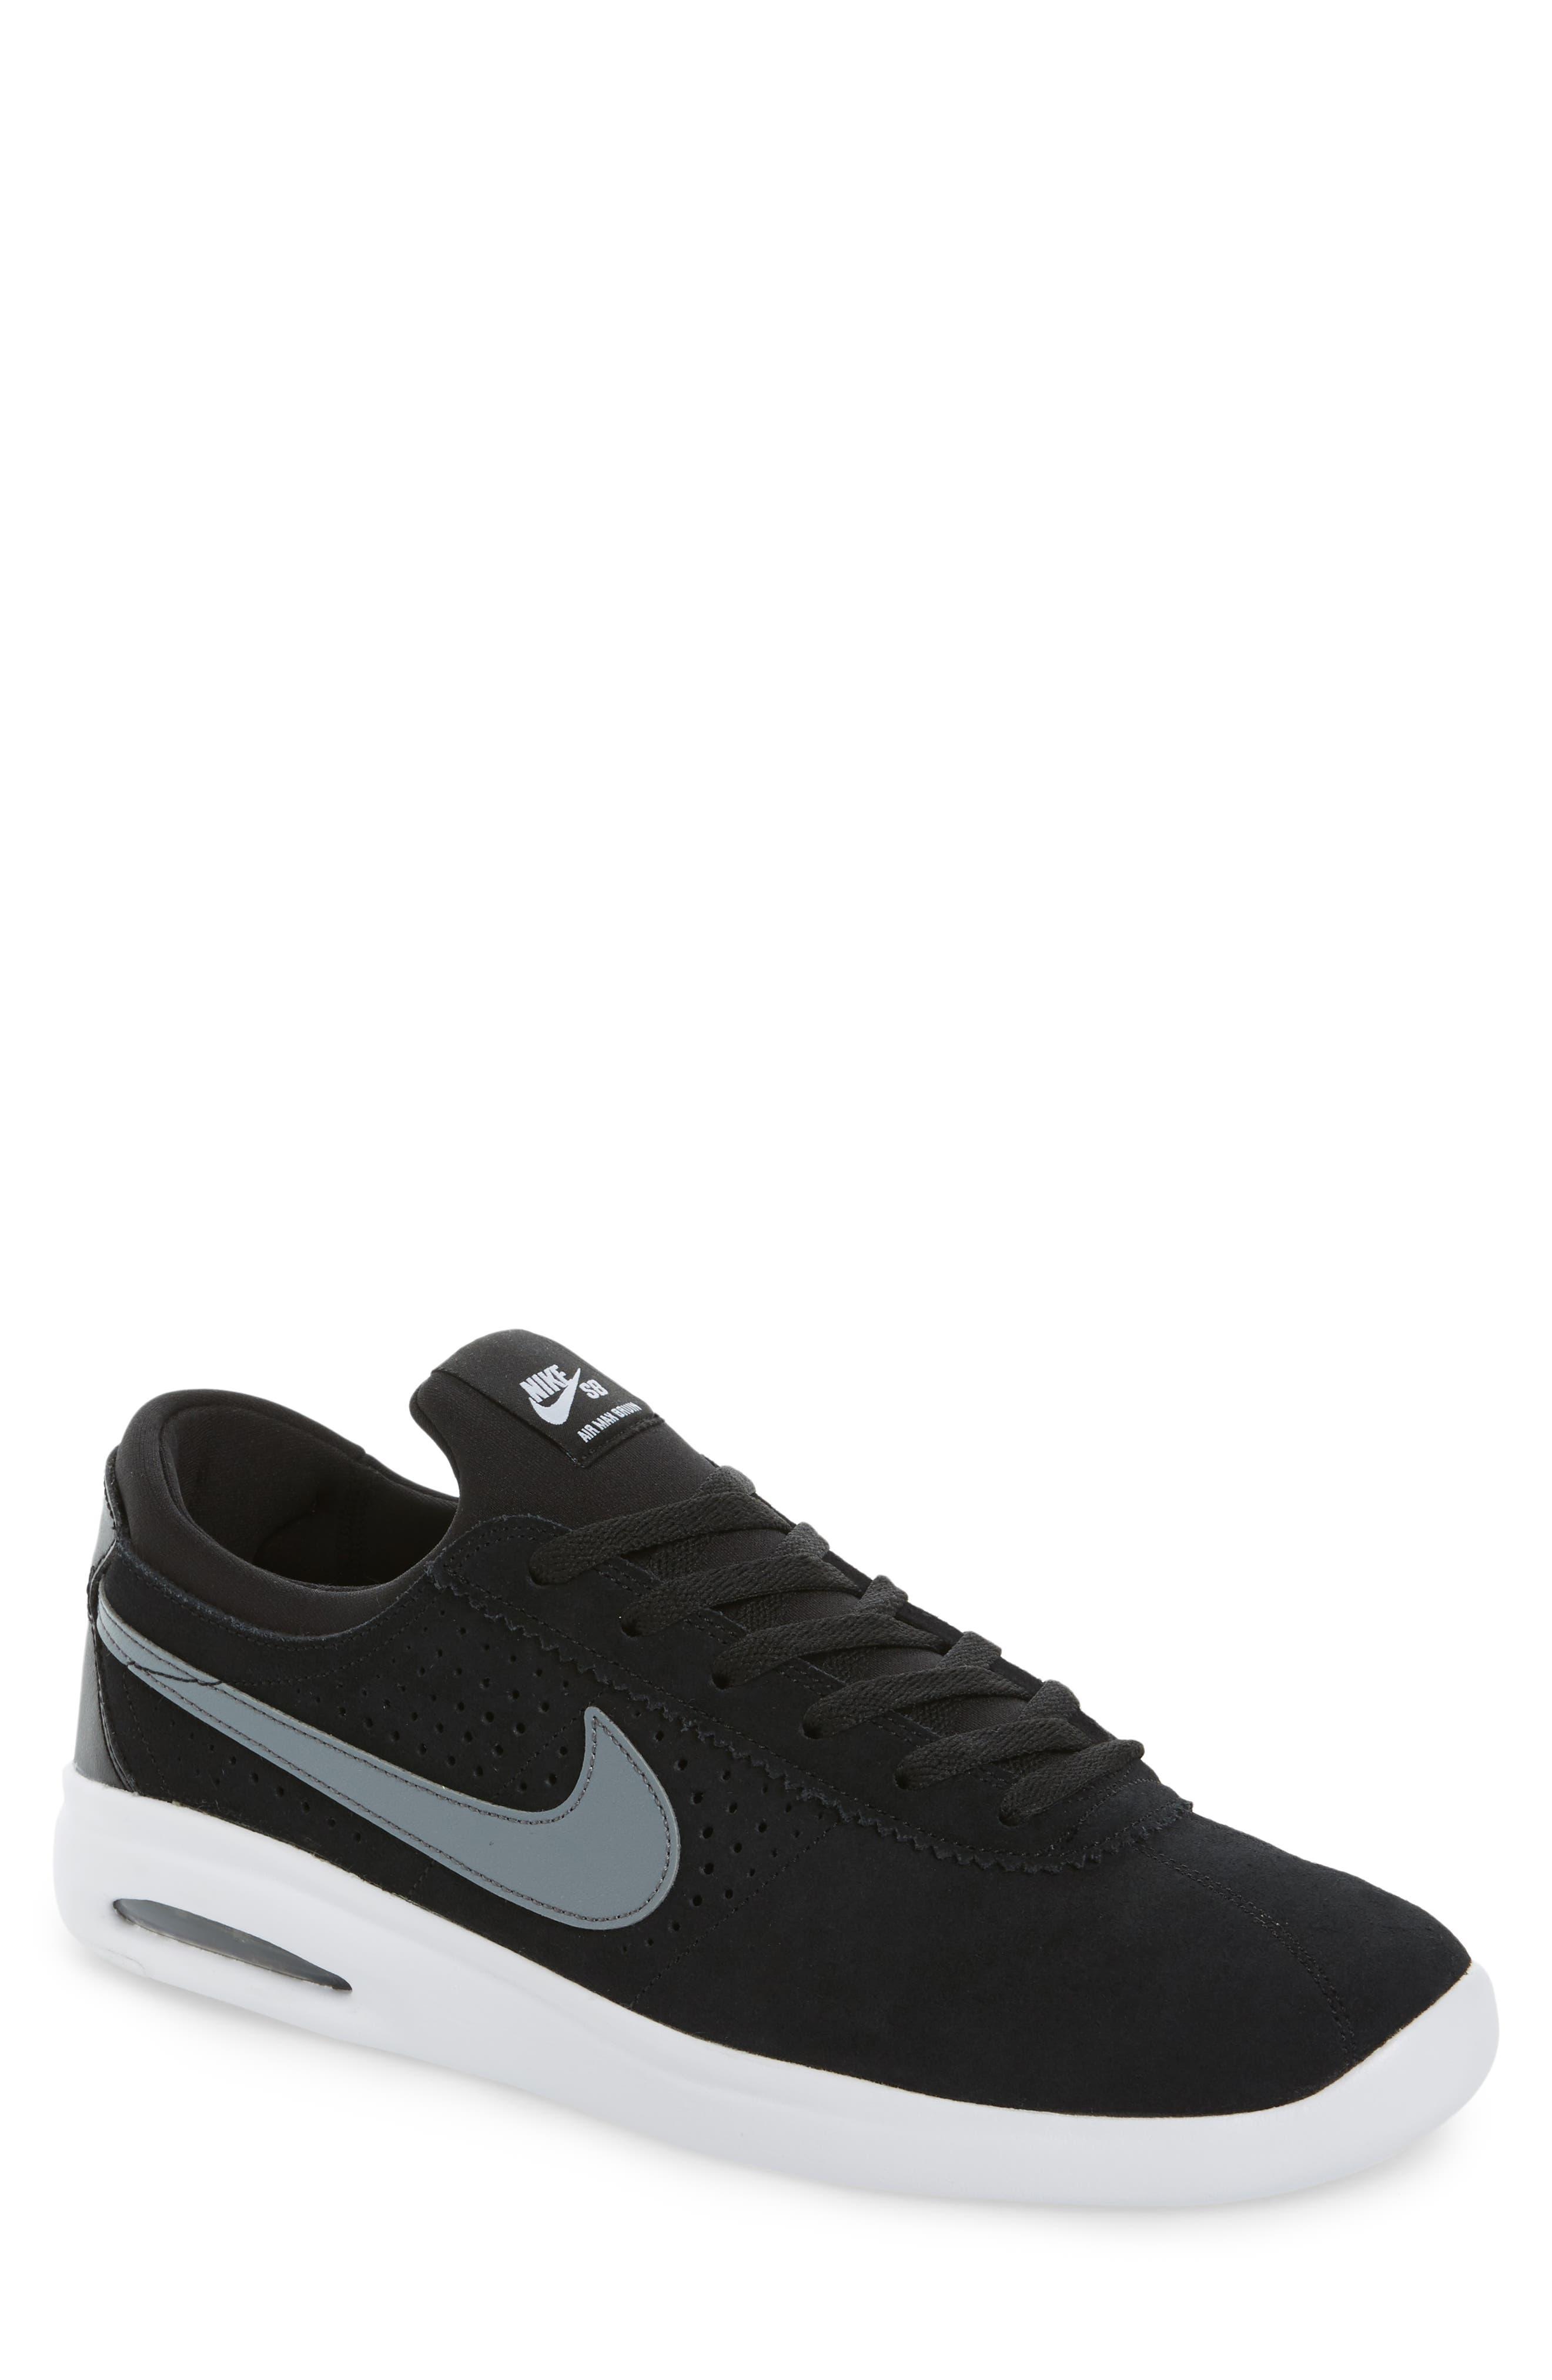 Main Image - Nike SB Air Max Bruin Vapor Skateboarding Sneaker (Men)